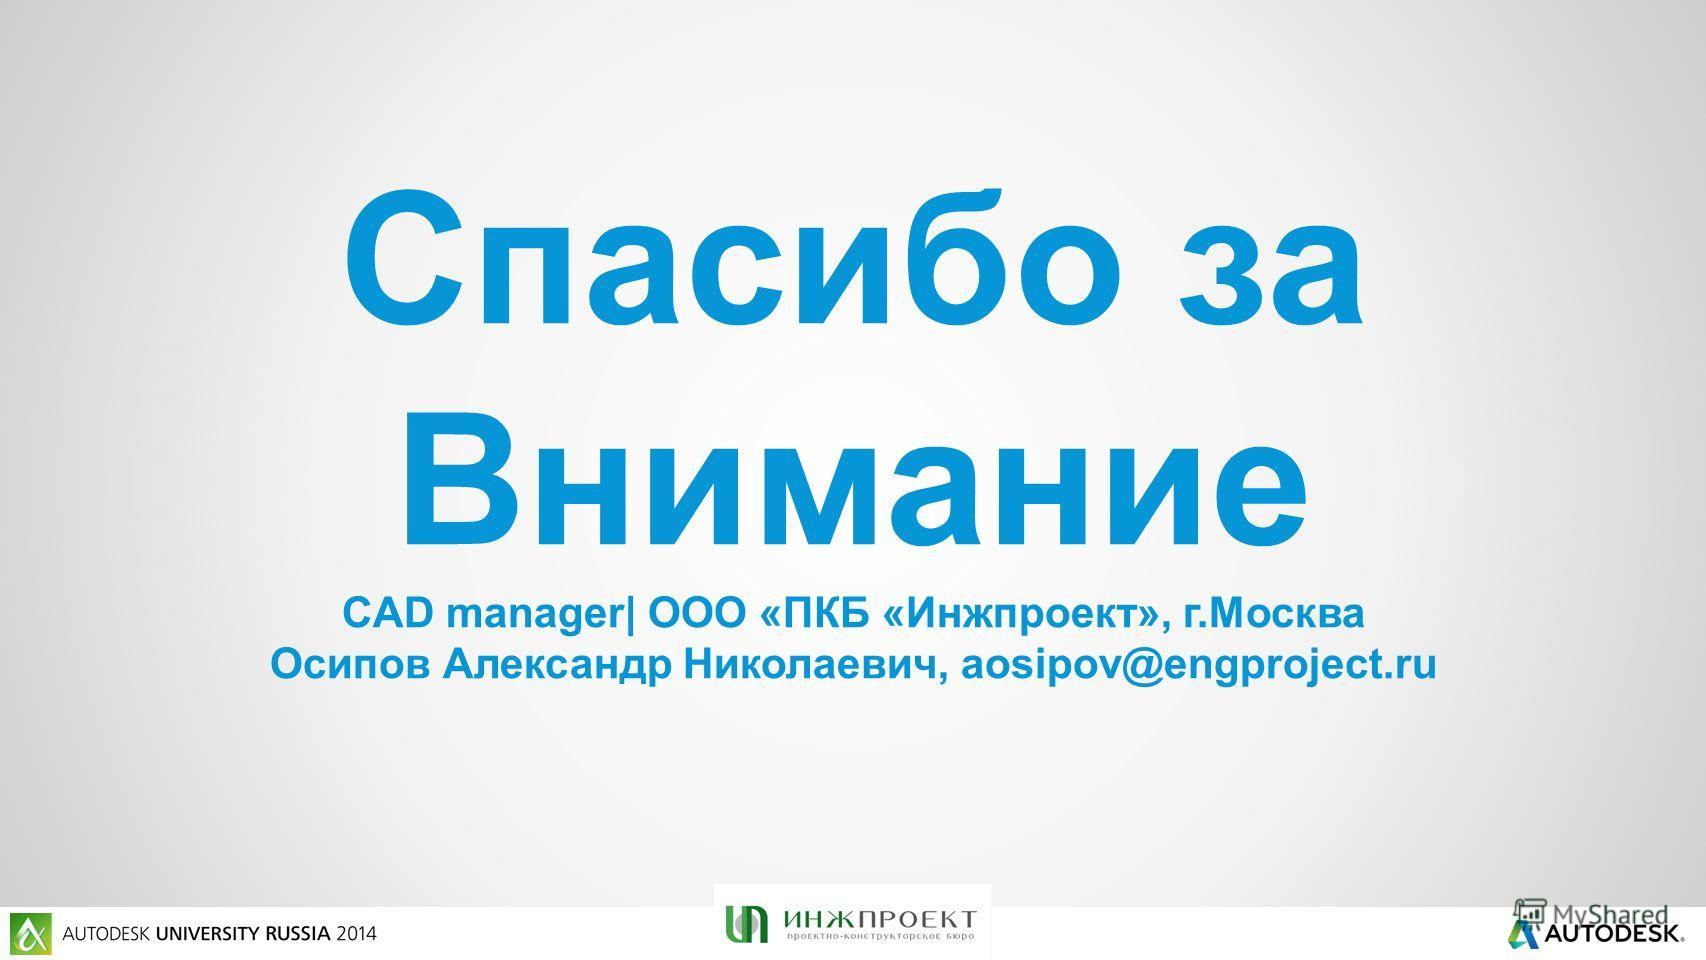 Спасибо за Внимание CAD manager| ООО «ПКБ «Инжпроект», г.Москва Осипов Александр Николаевич, aosipov@engproject.ru